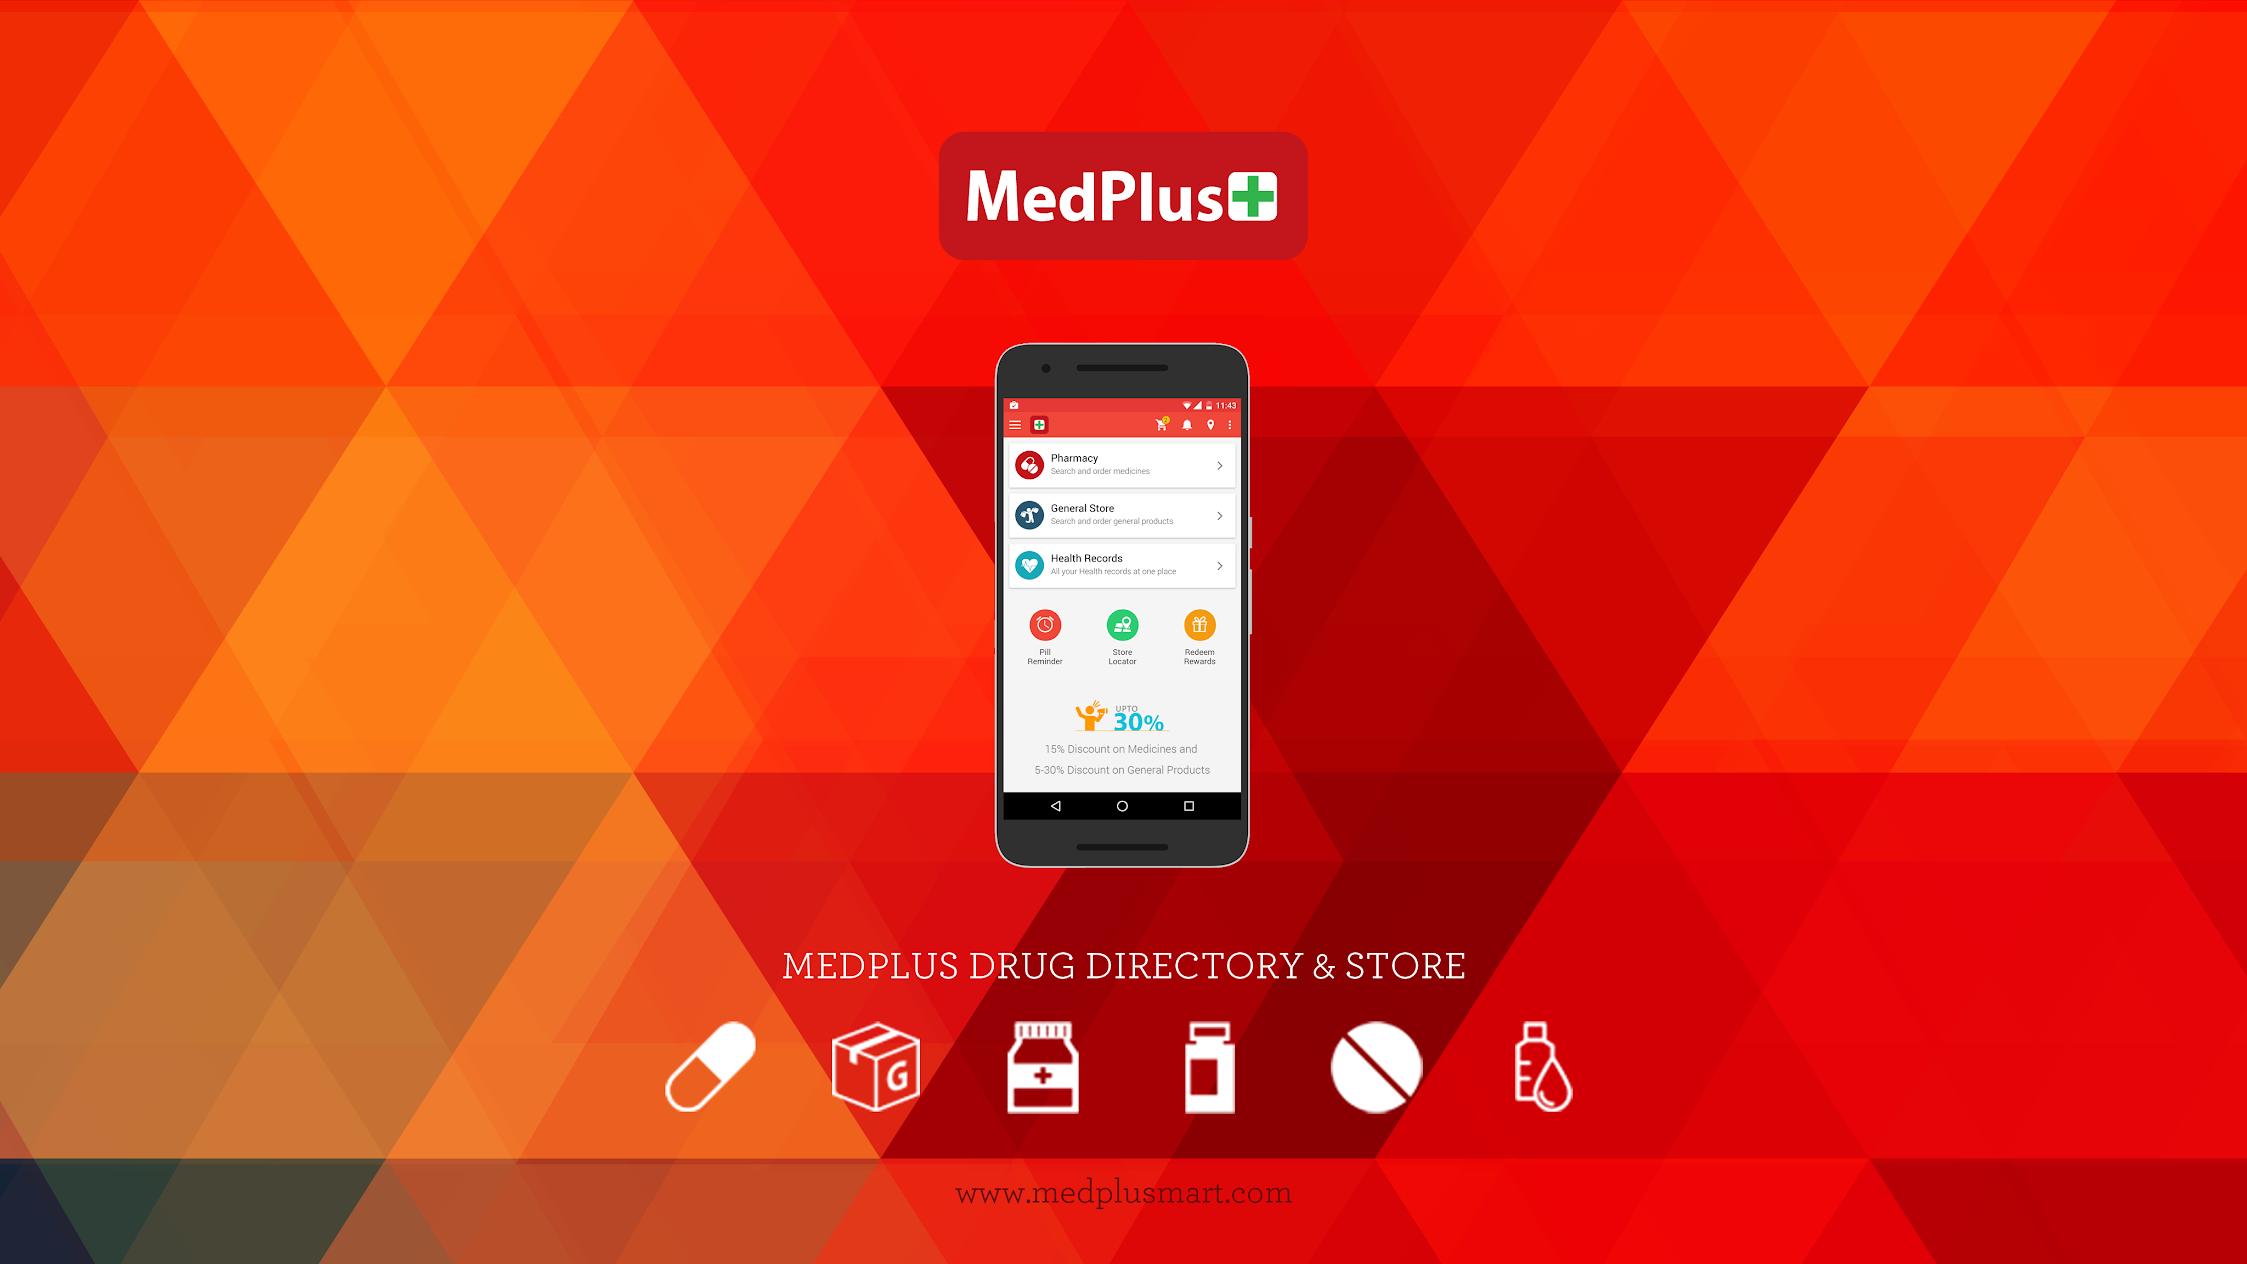 MedPlus Health Services Pvt. Ltd